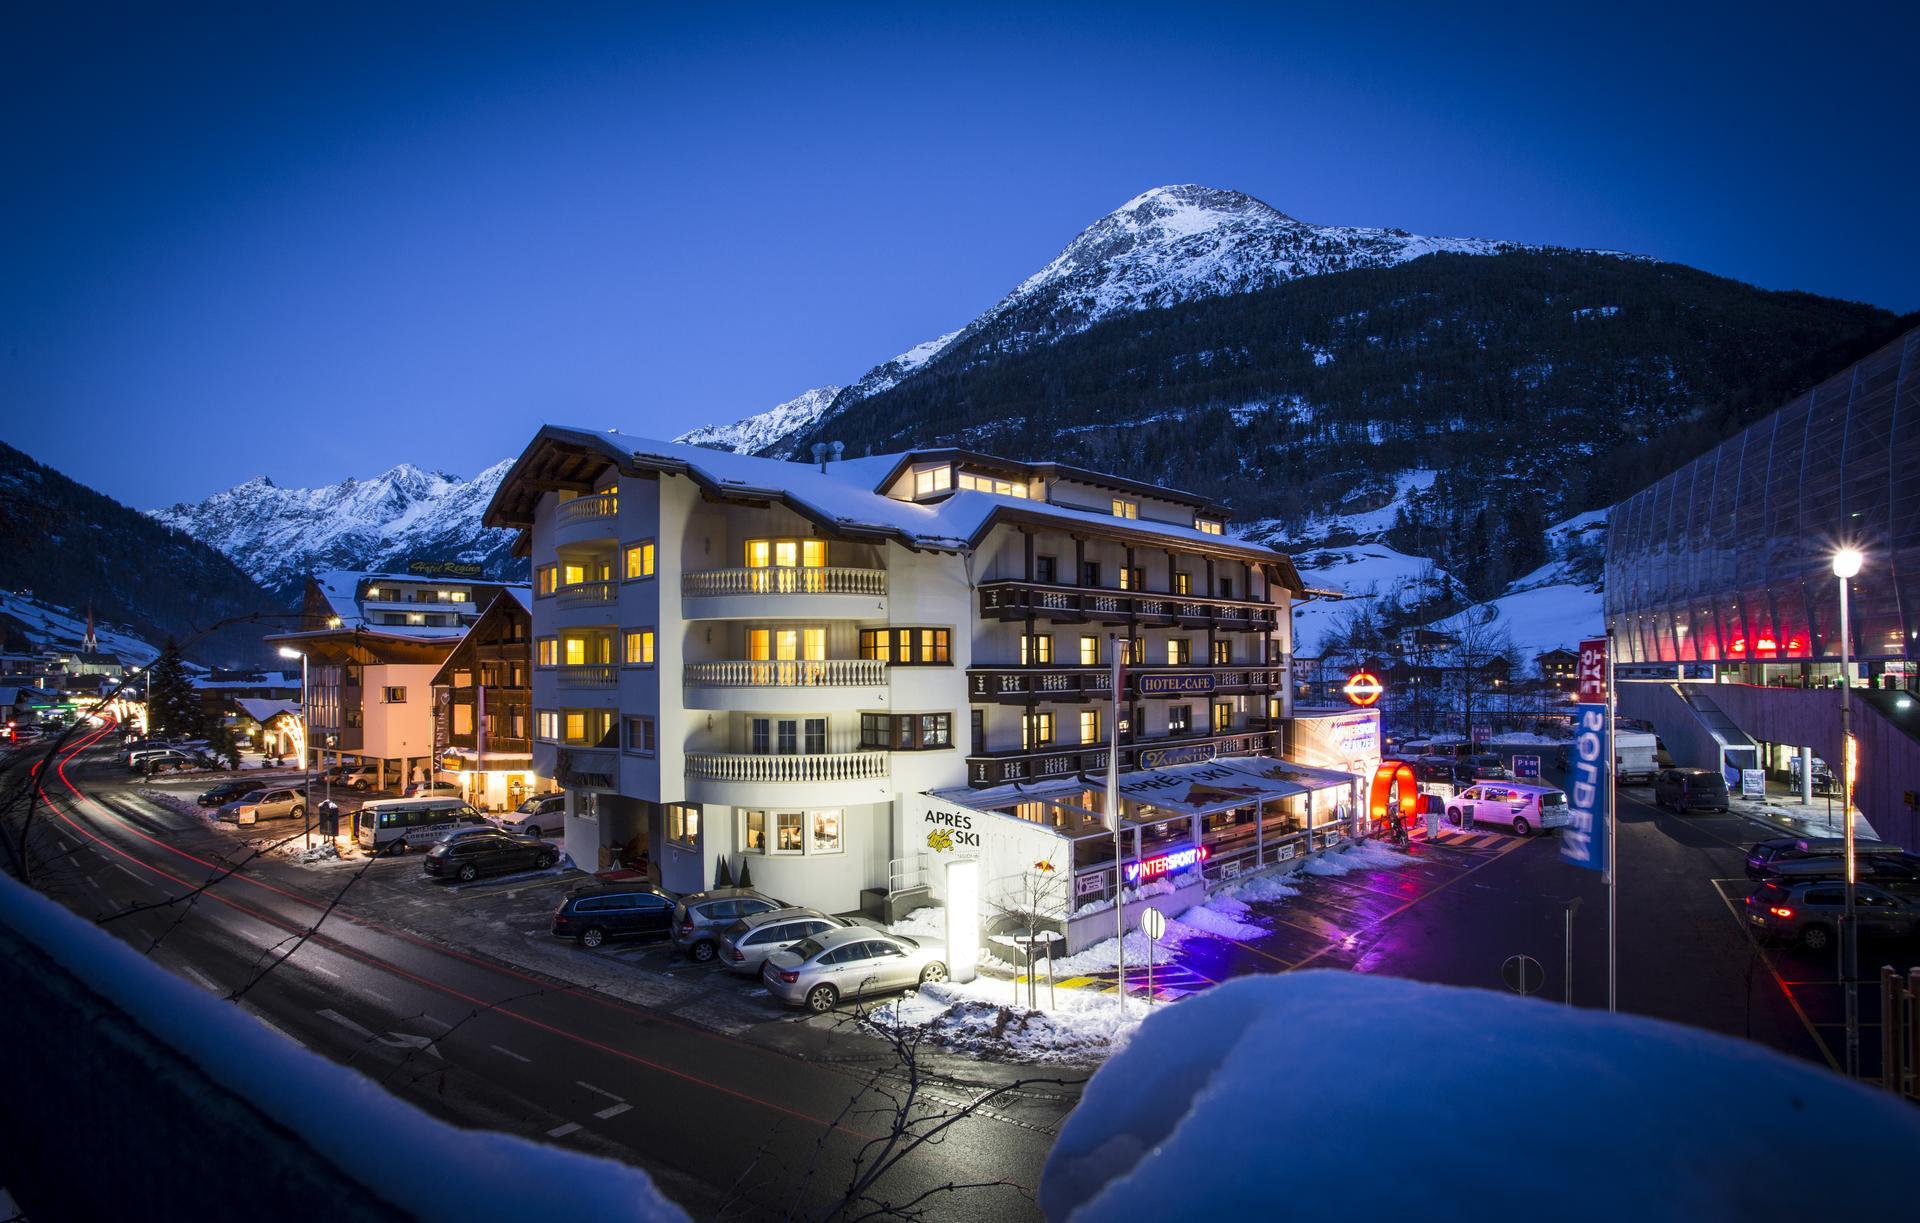 Design hotel valentin in s lden direkt am skilift for Hotel design tirol